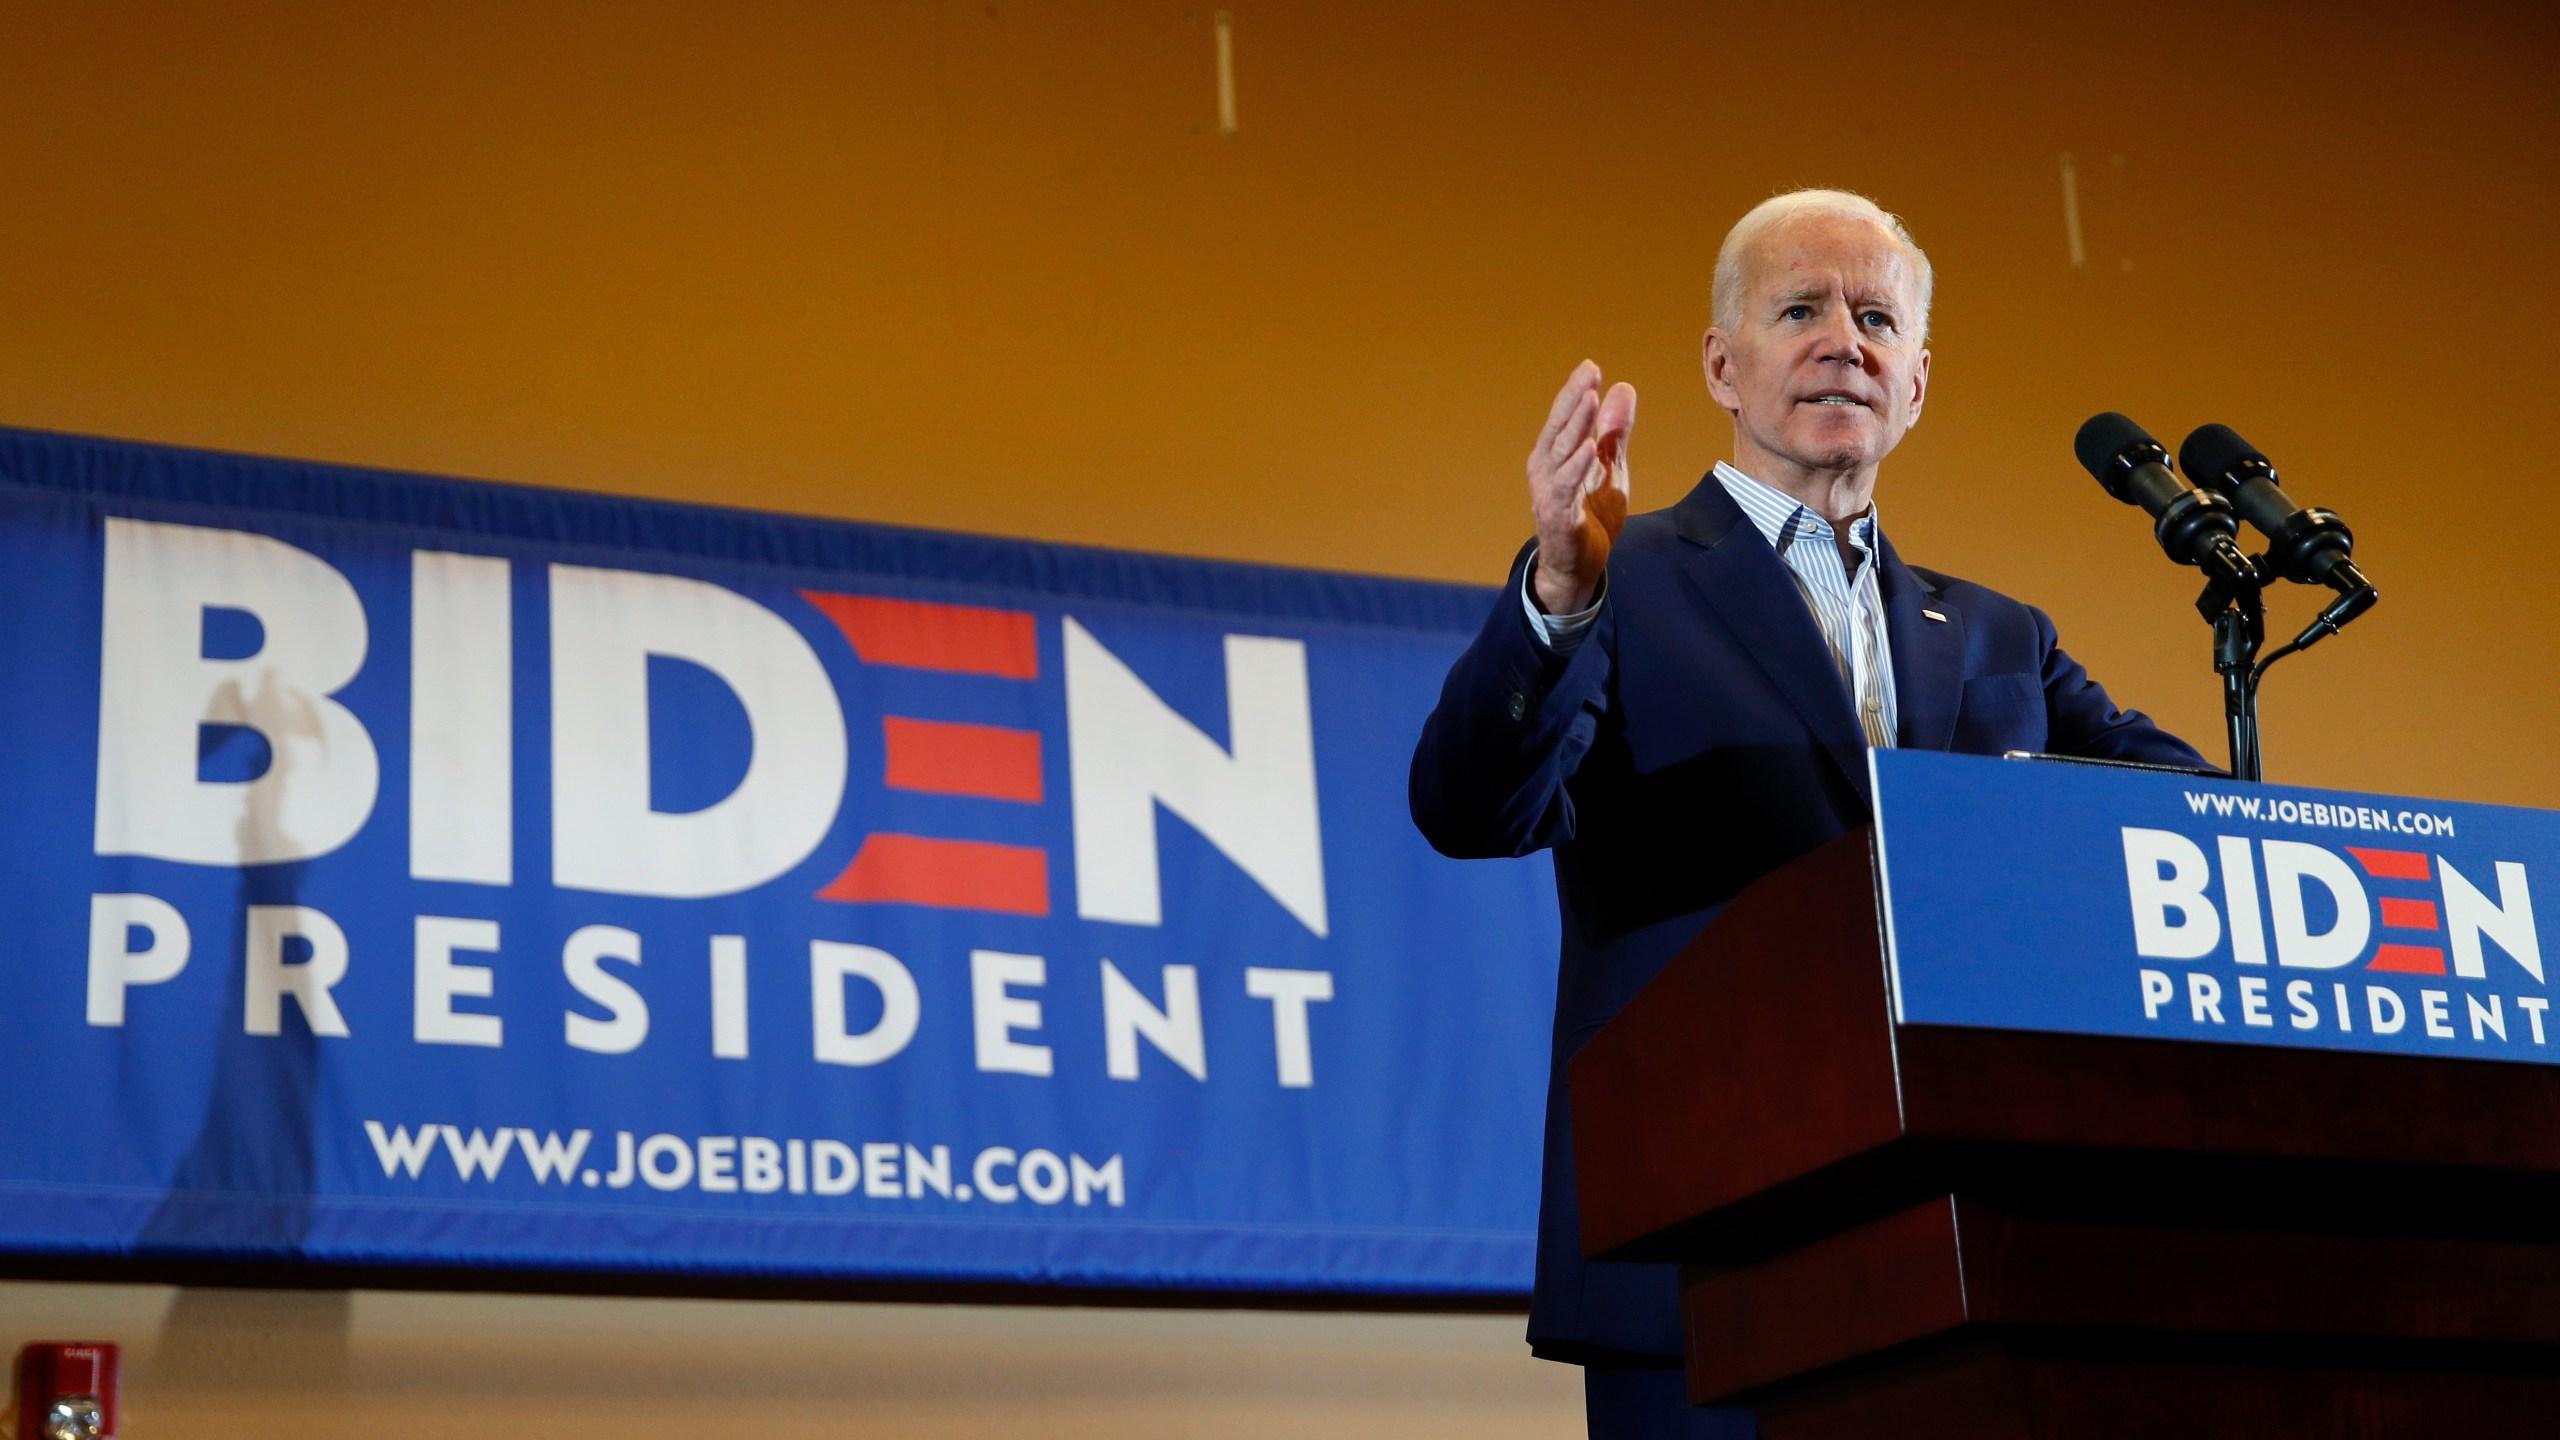 Election_2020_Joe_Biden_22205-159532.jpg43323486